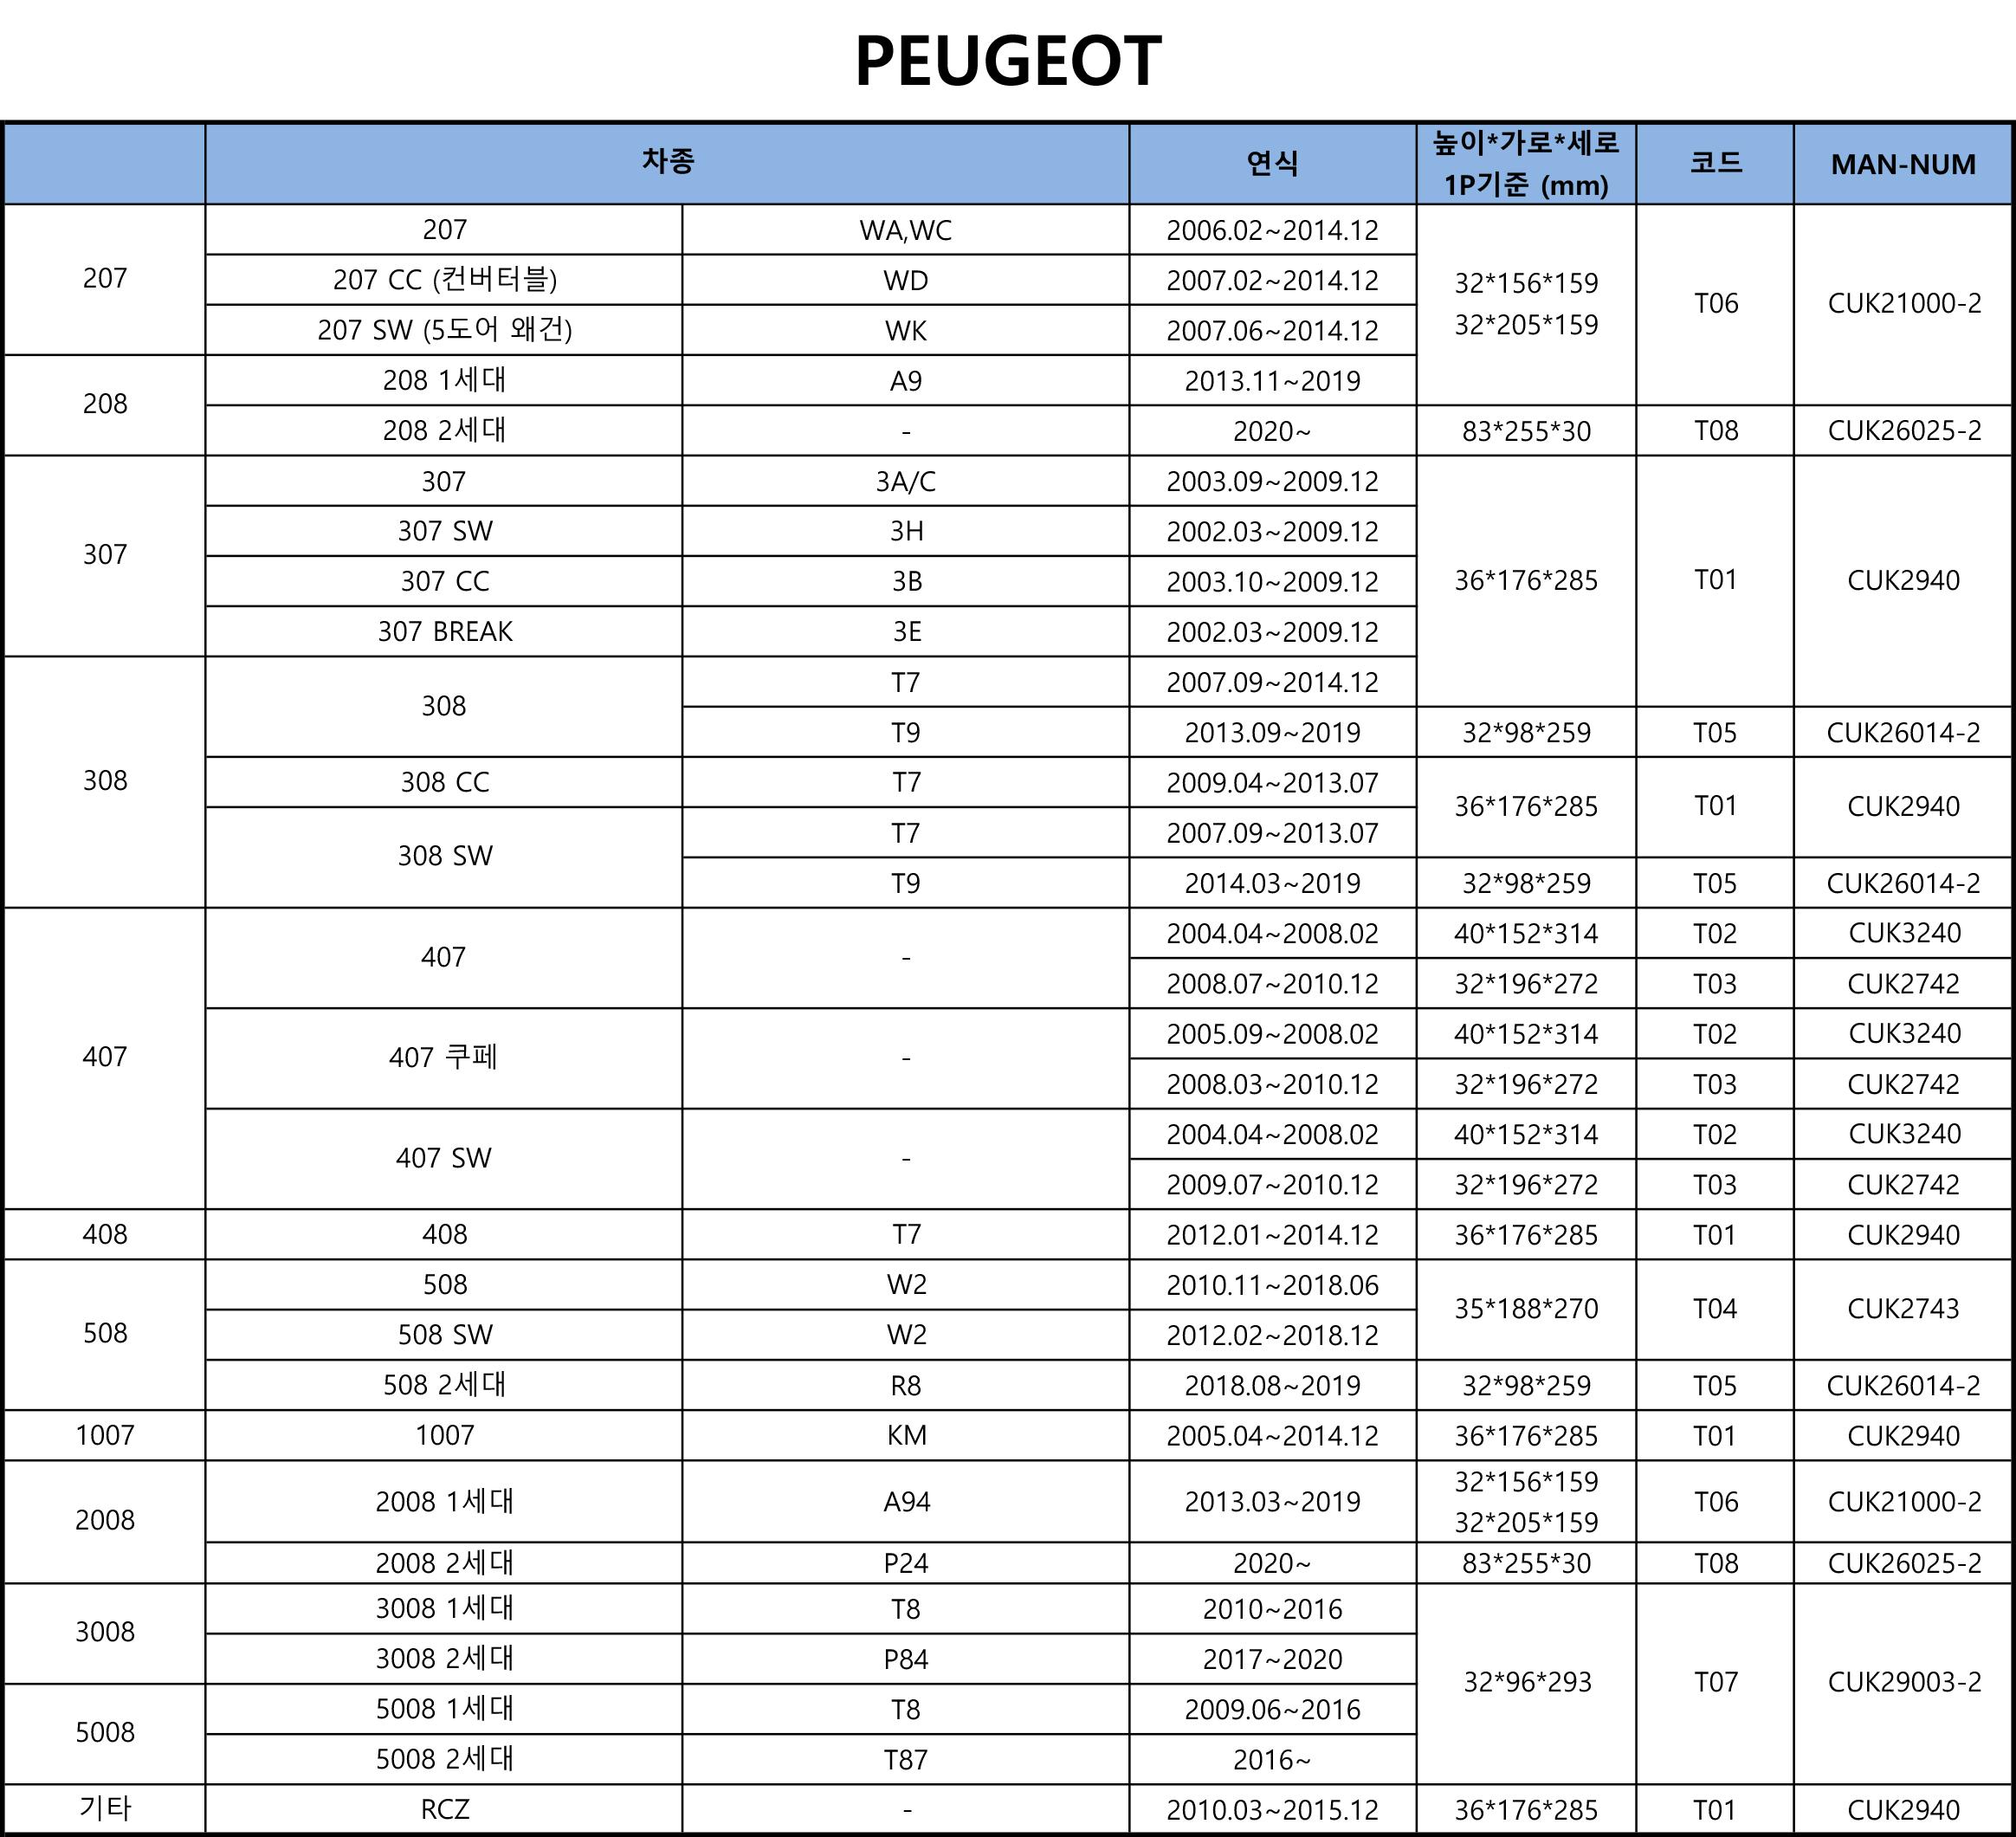 4-PEUGEOT.png